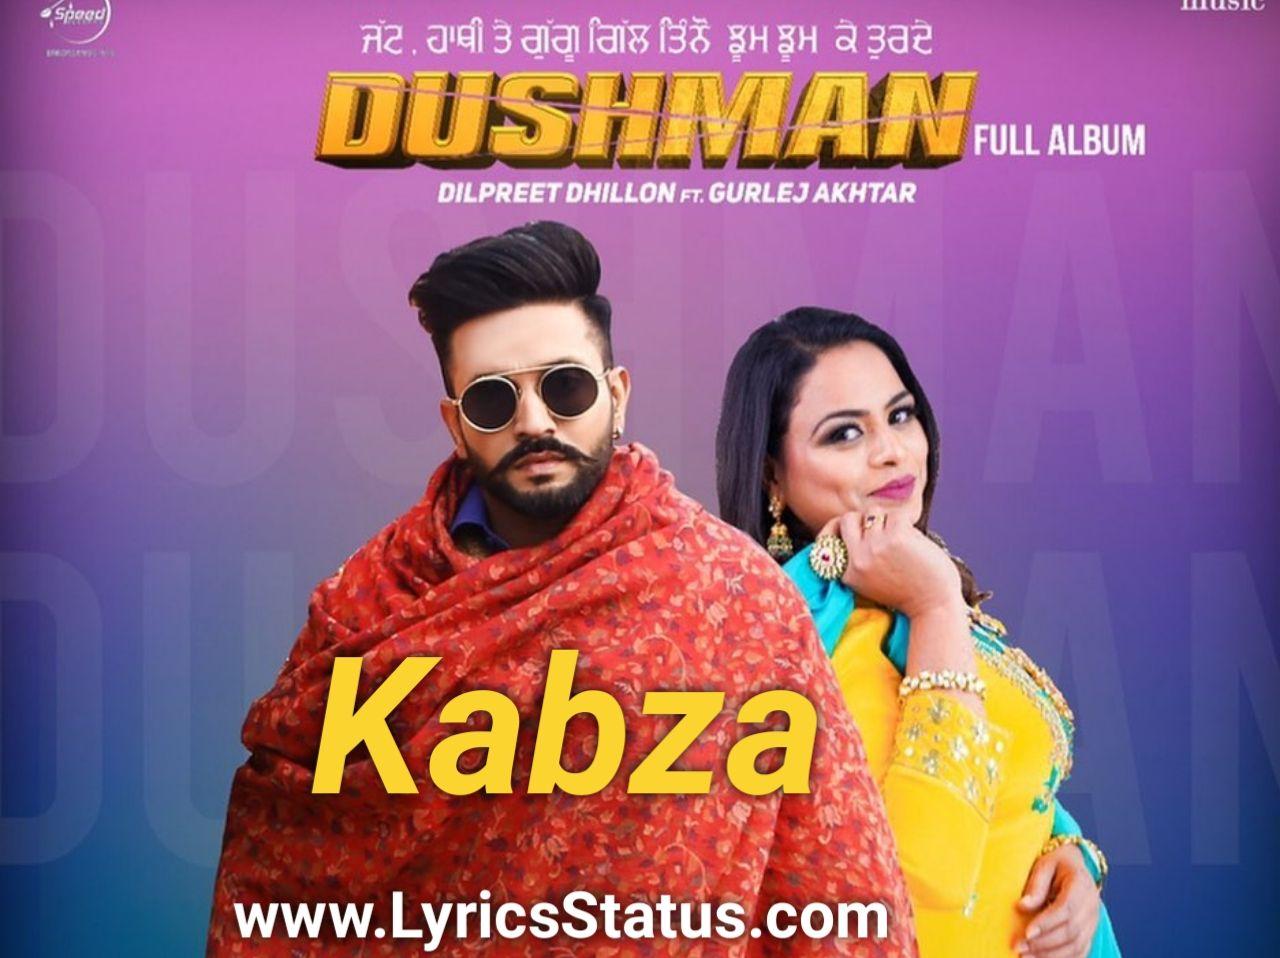 Jatt Kabze Len Da Shonki Dilpreet Dhillon Lyrics Status Download In 2020 Latest Song Lyrics Lyrics Songs